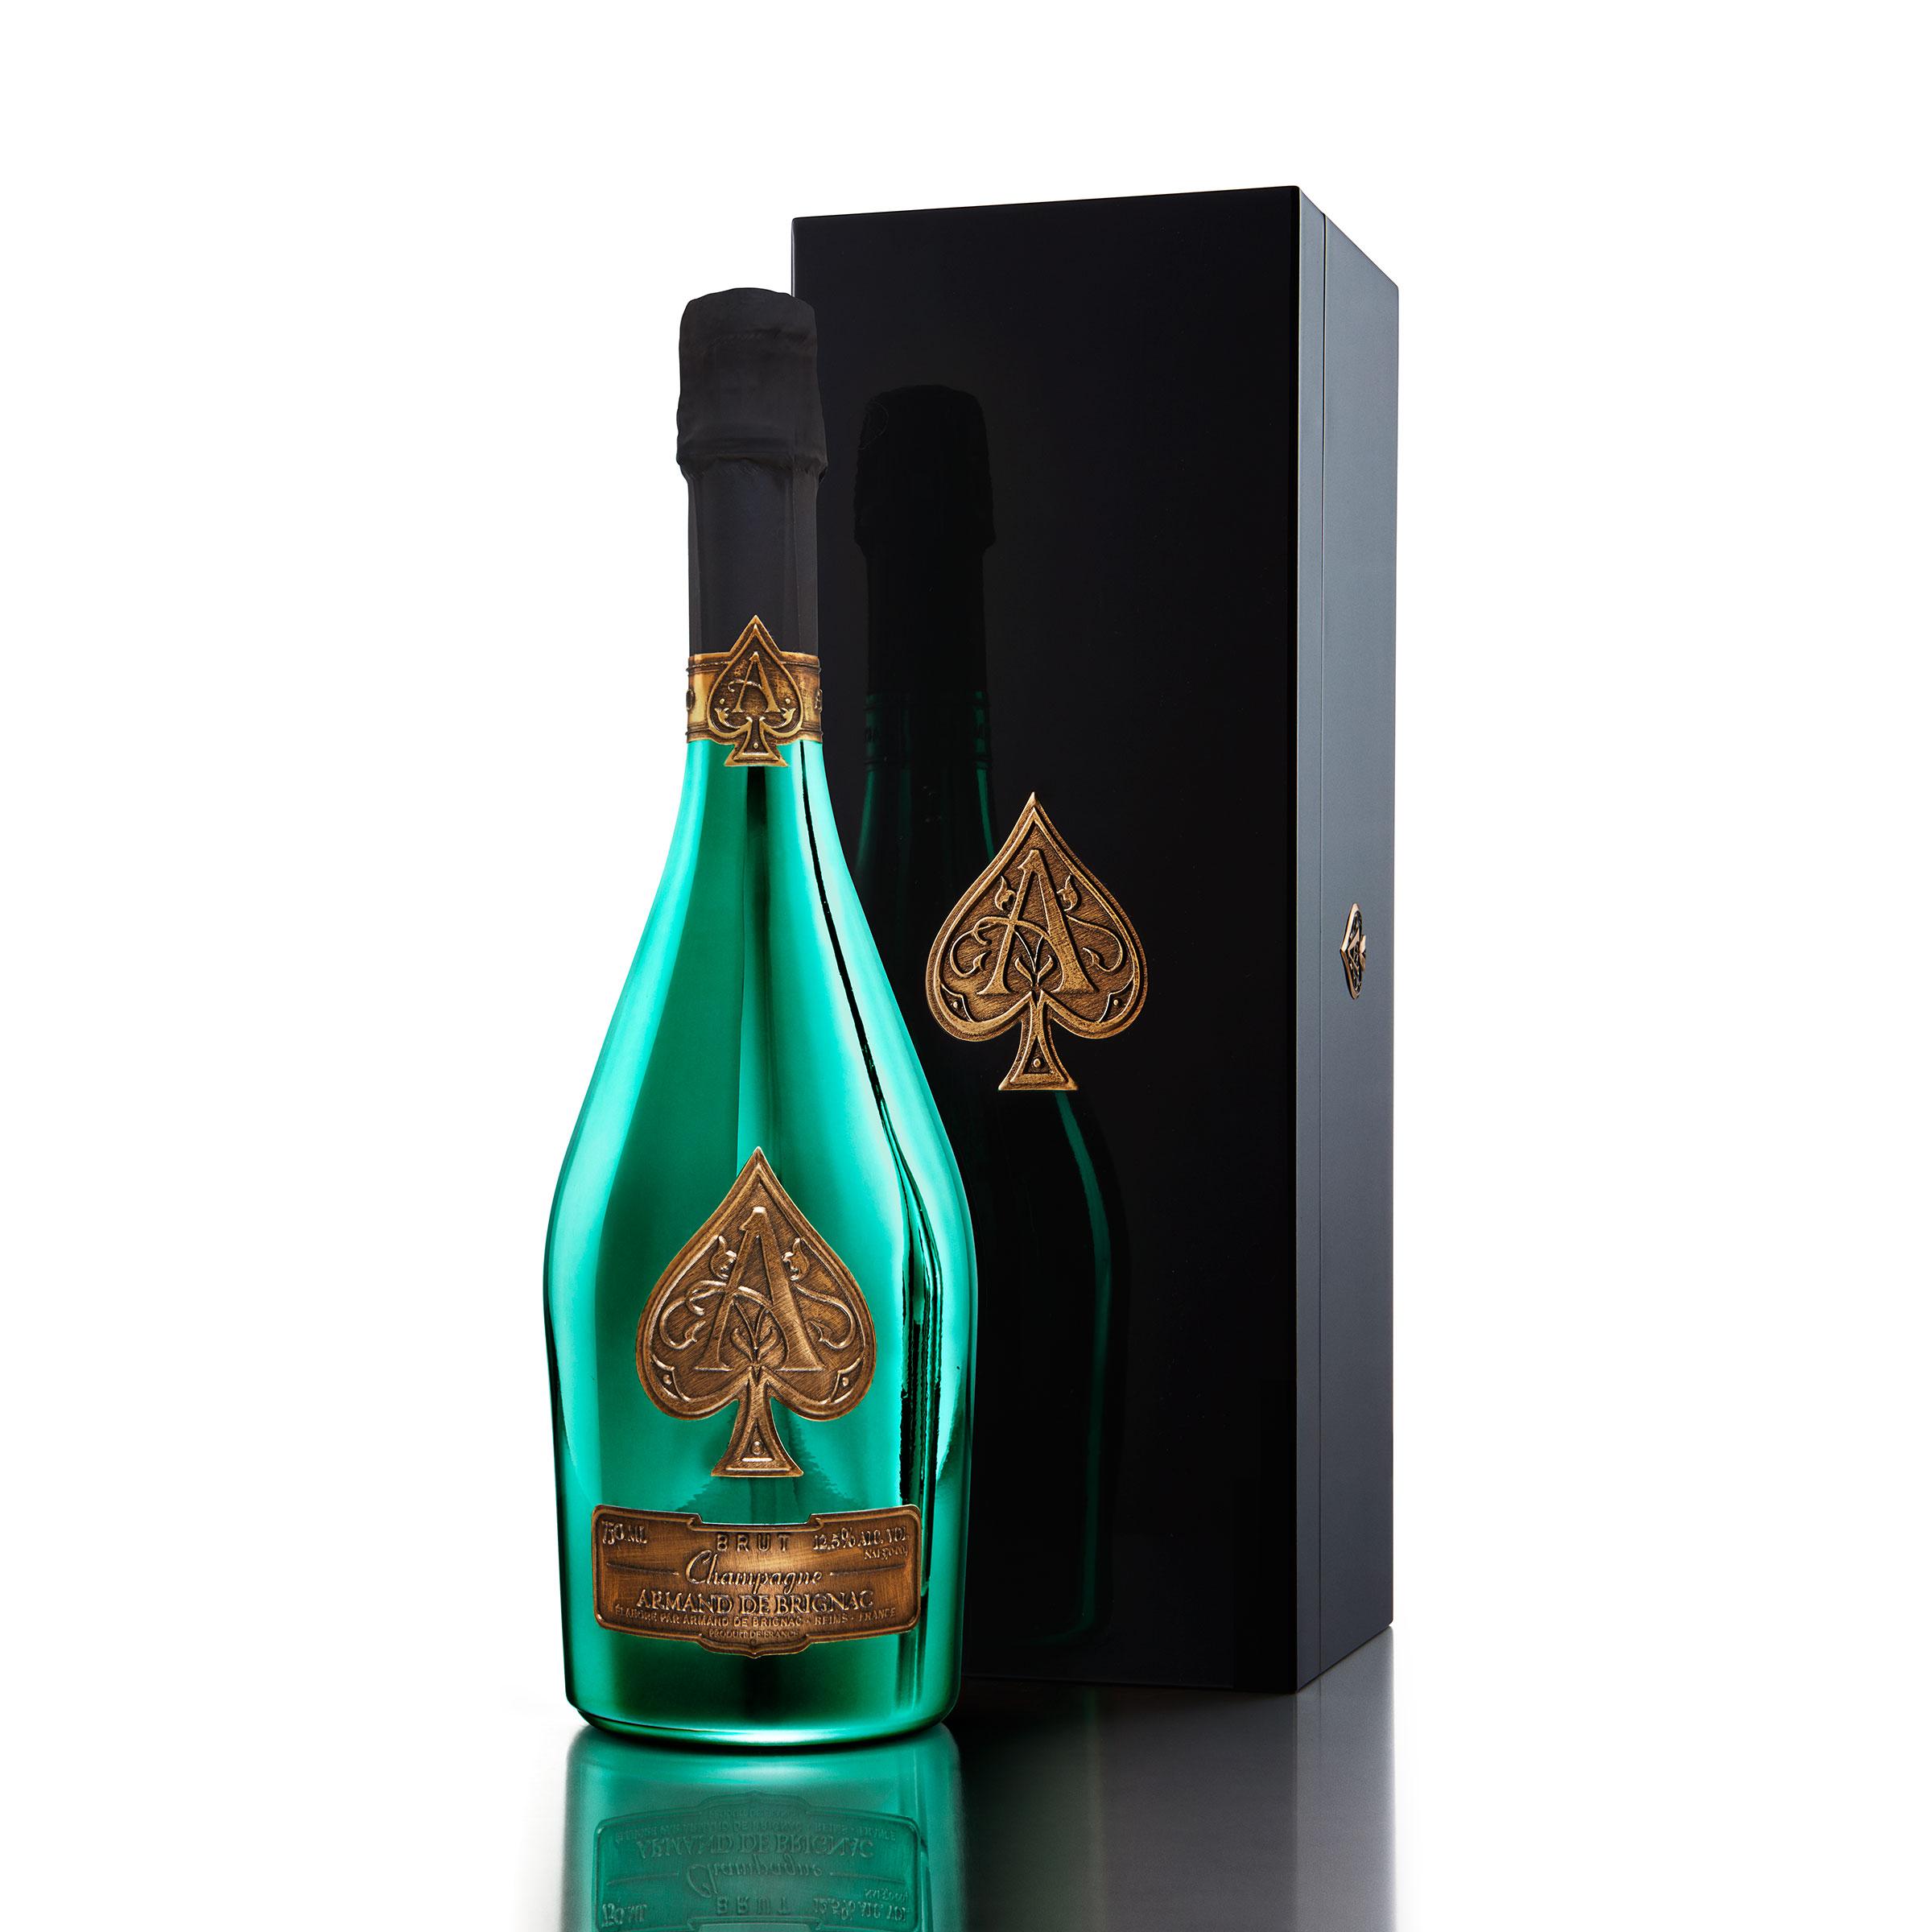 Armand de Brignac 75cl Limited Edition Green Bottle